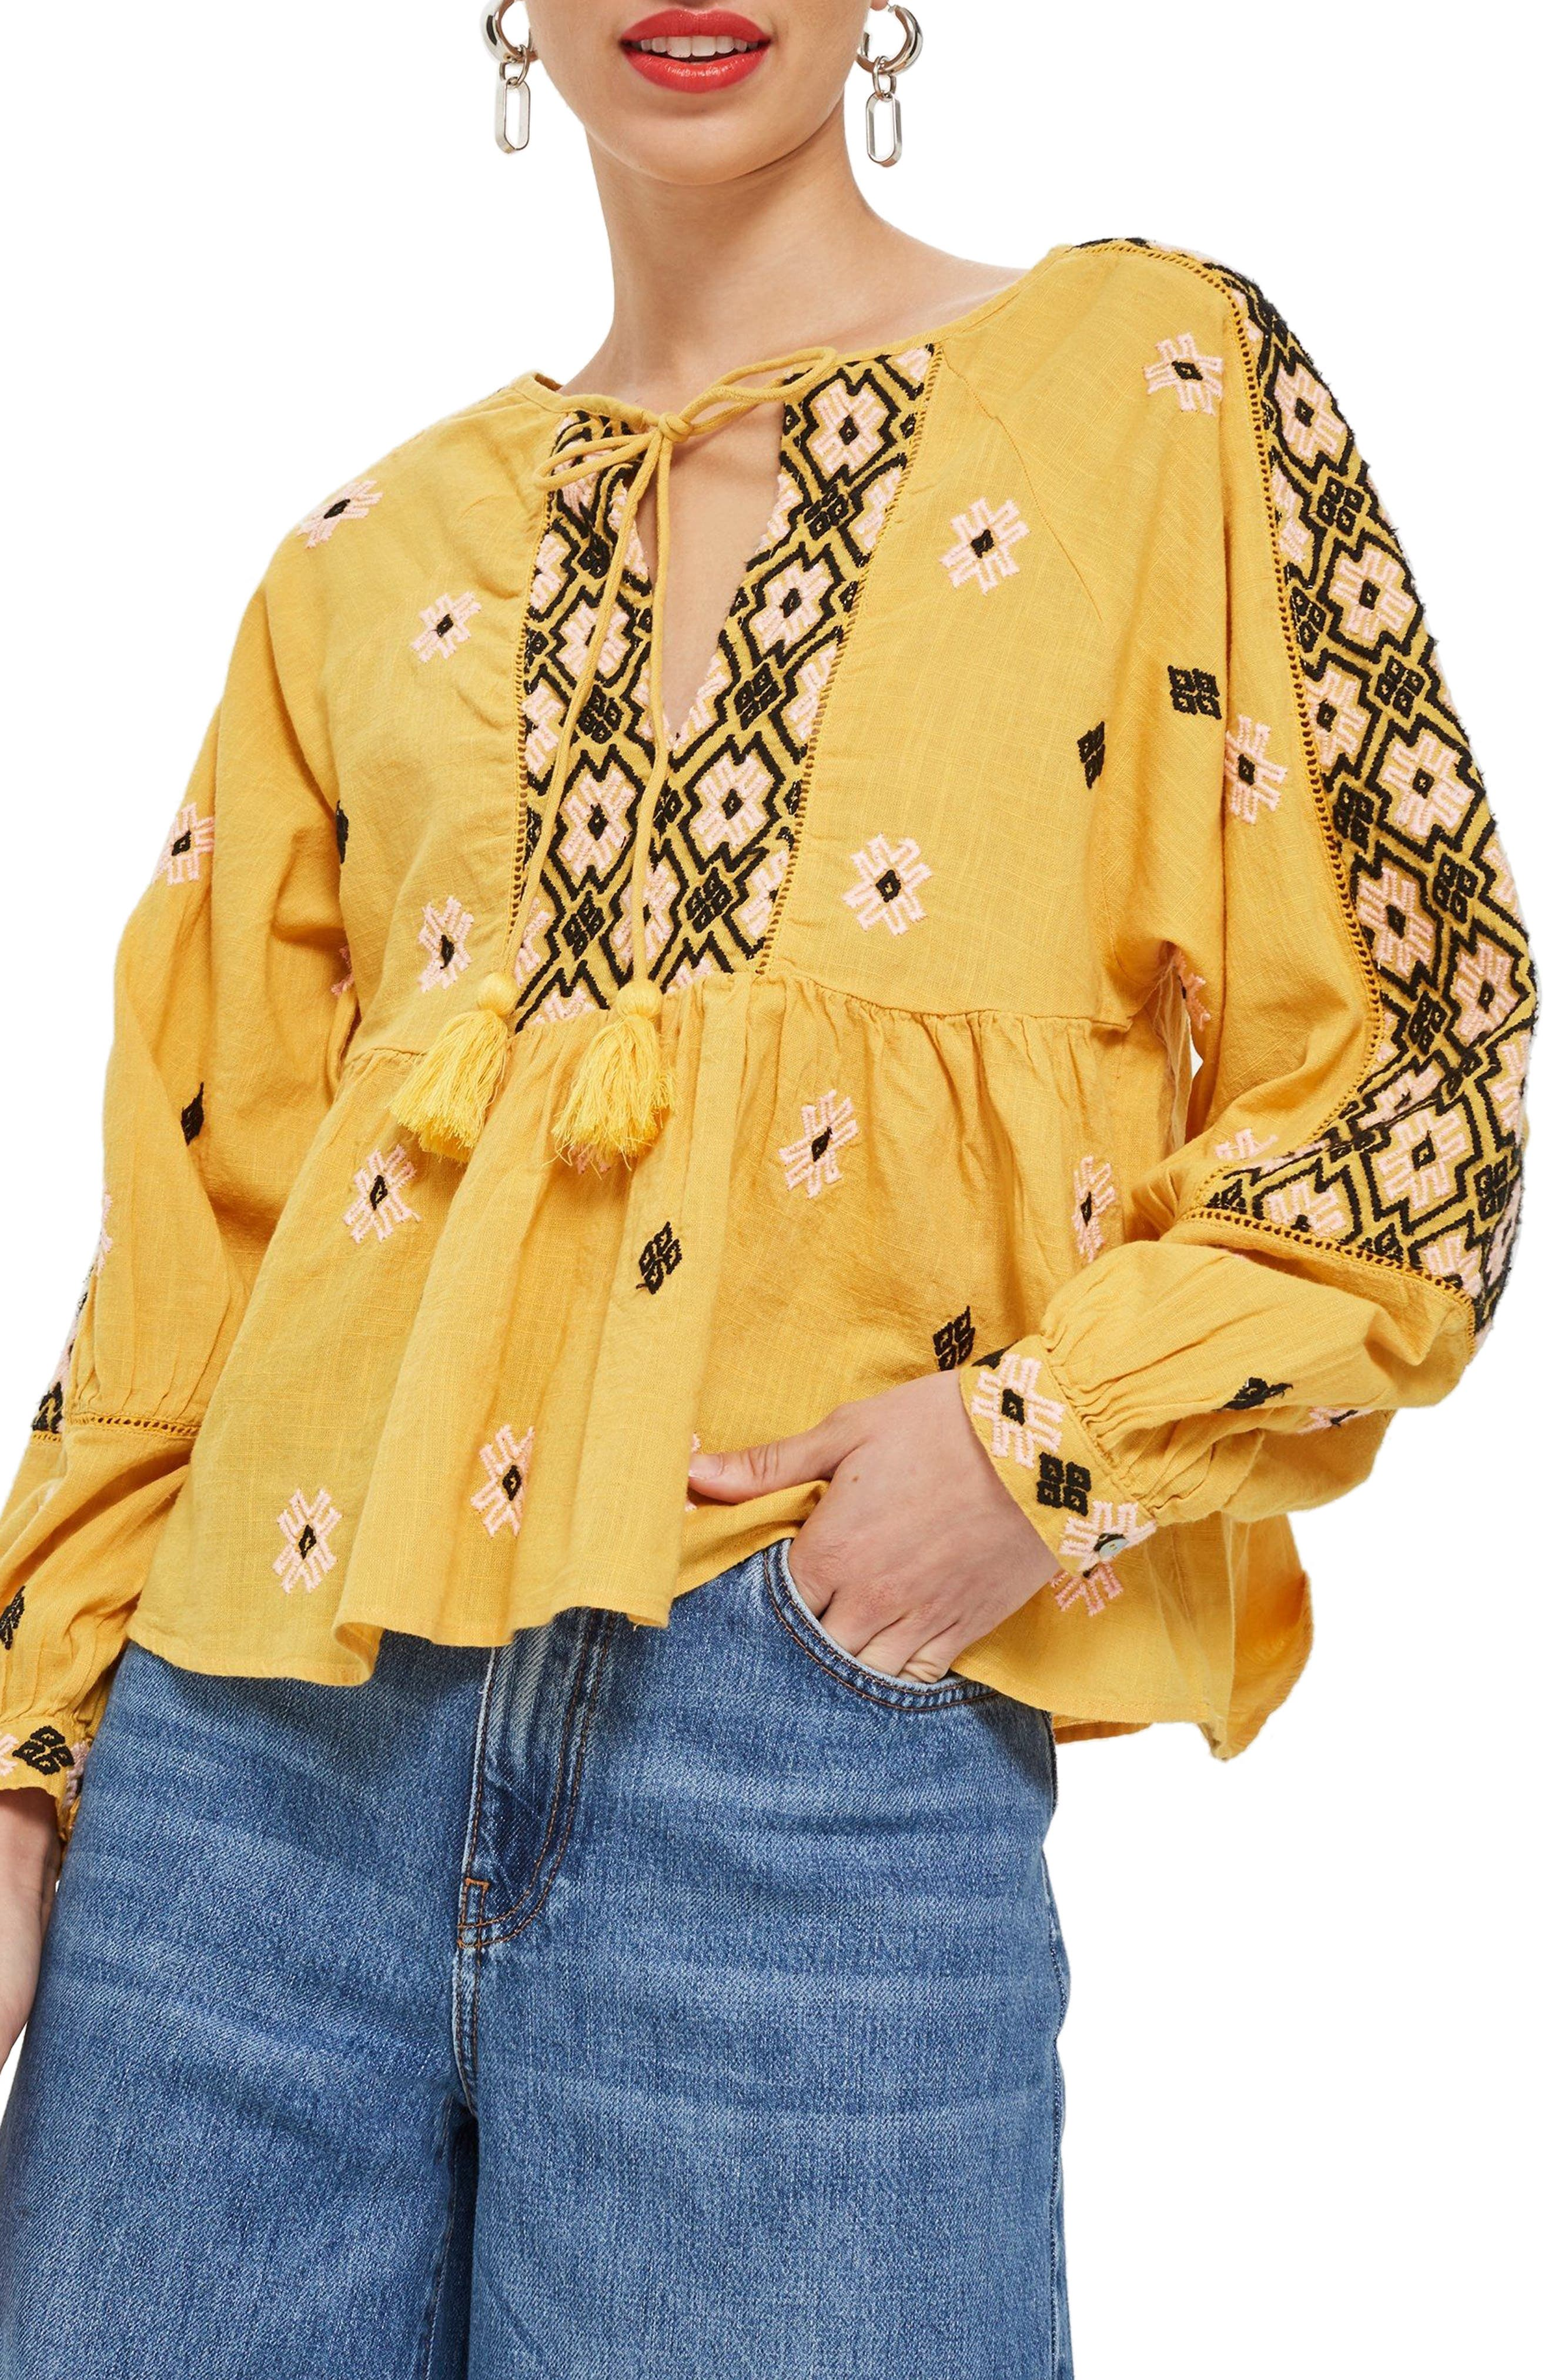 Main Image - Topshop Embroidered Ruffle Hem Top